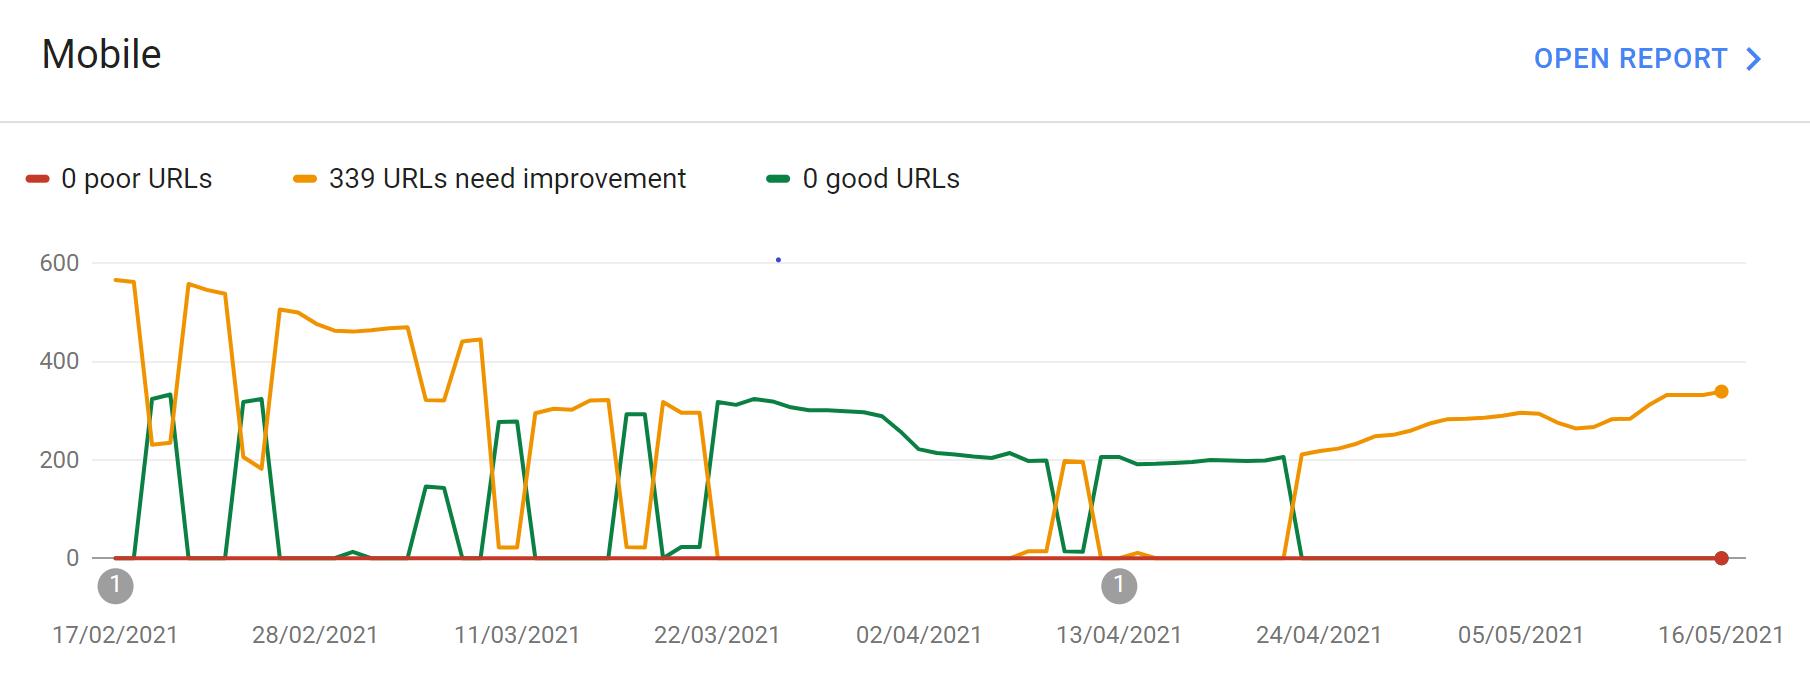 Example Core Web Vitals report from Google Search Console